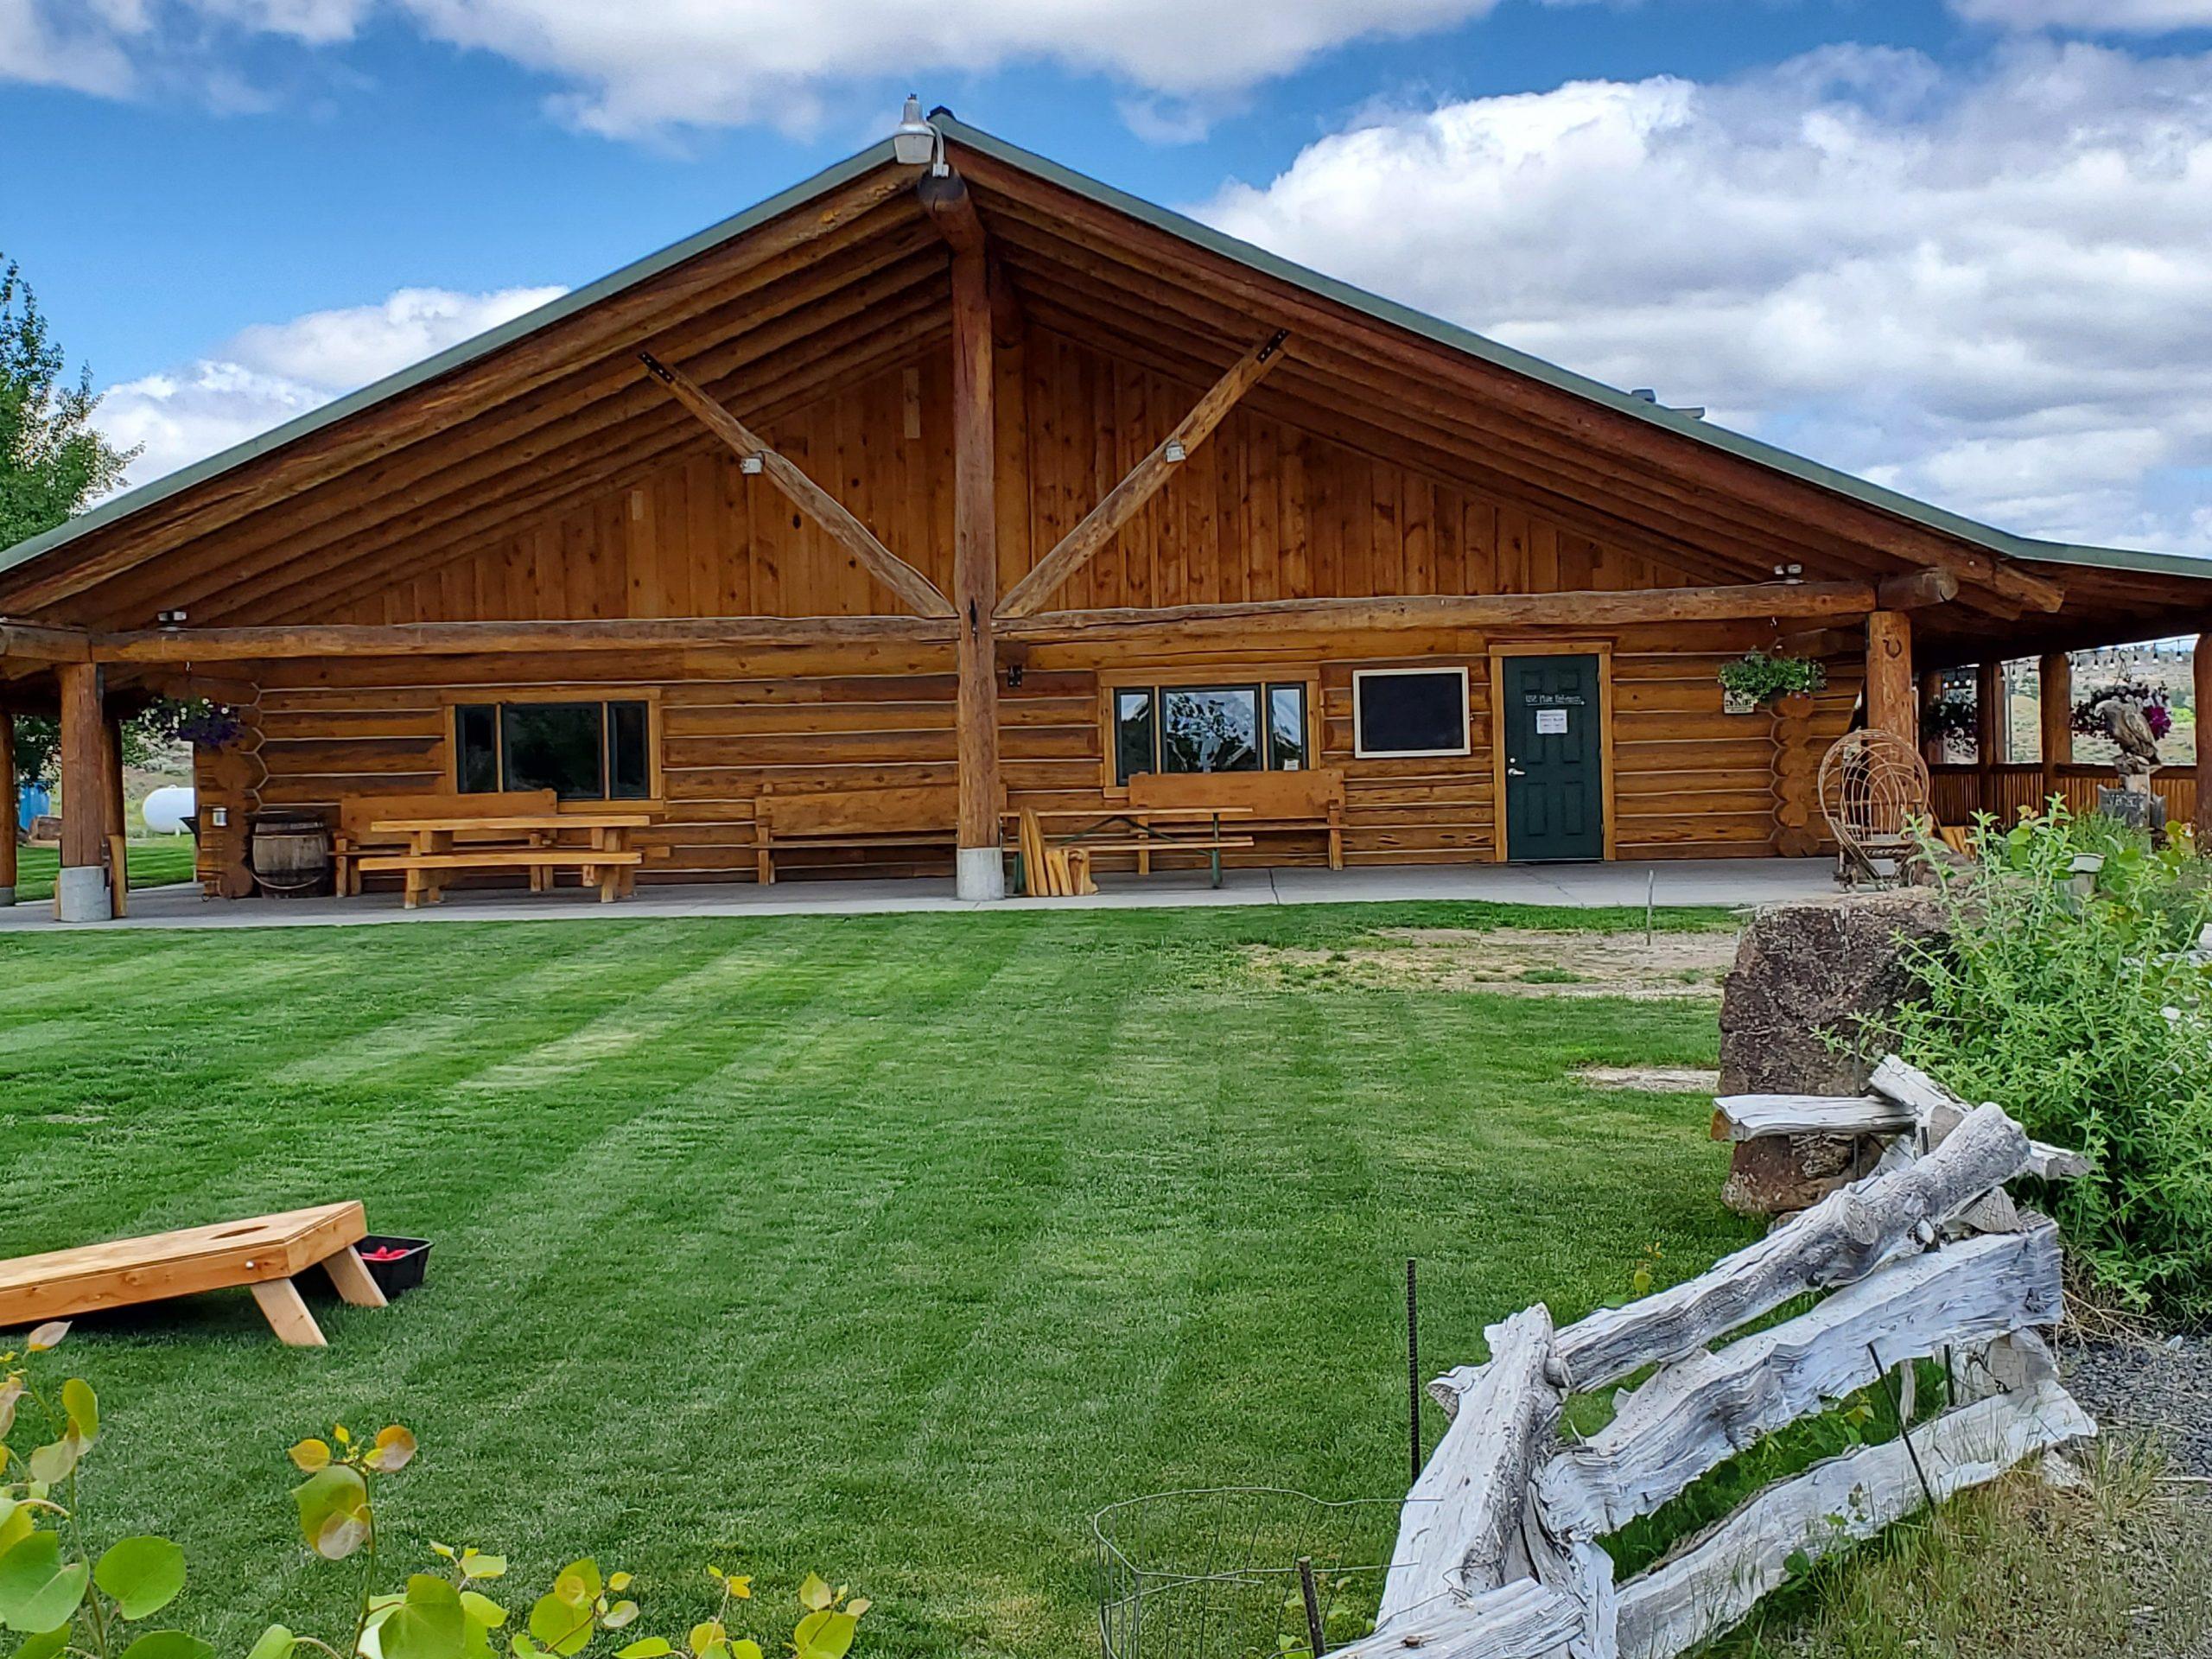 Bosch's Big Bear RV and Campground